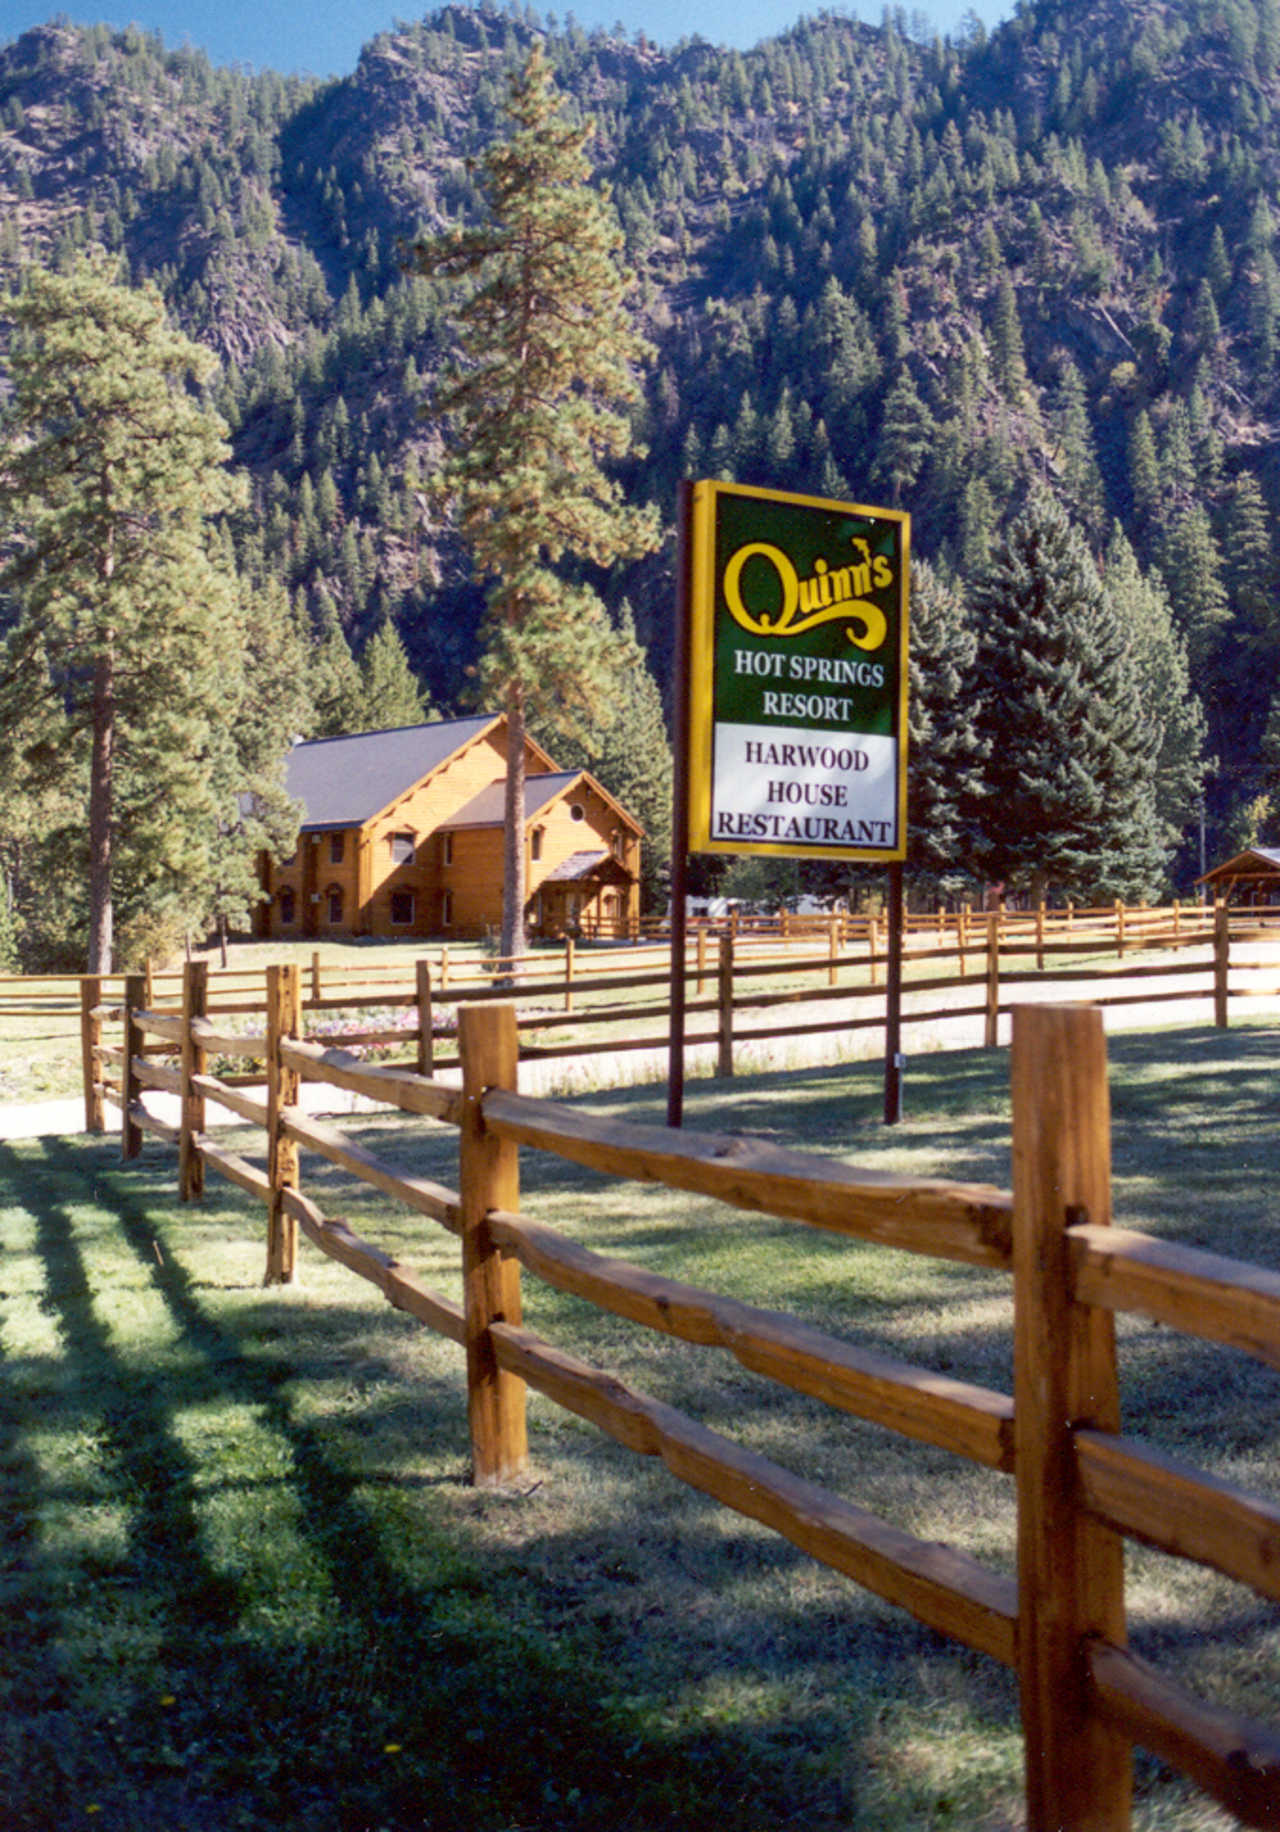 Quinn's Hot Springs Resort - Travel - Resorts in Paradise MT